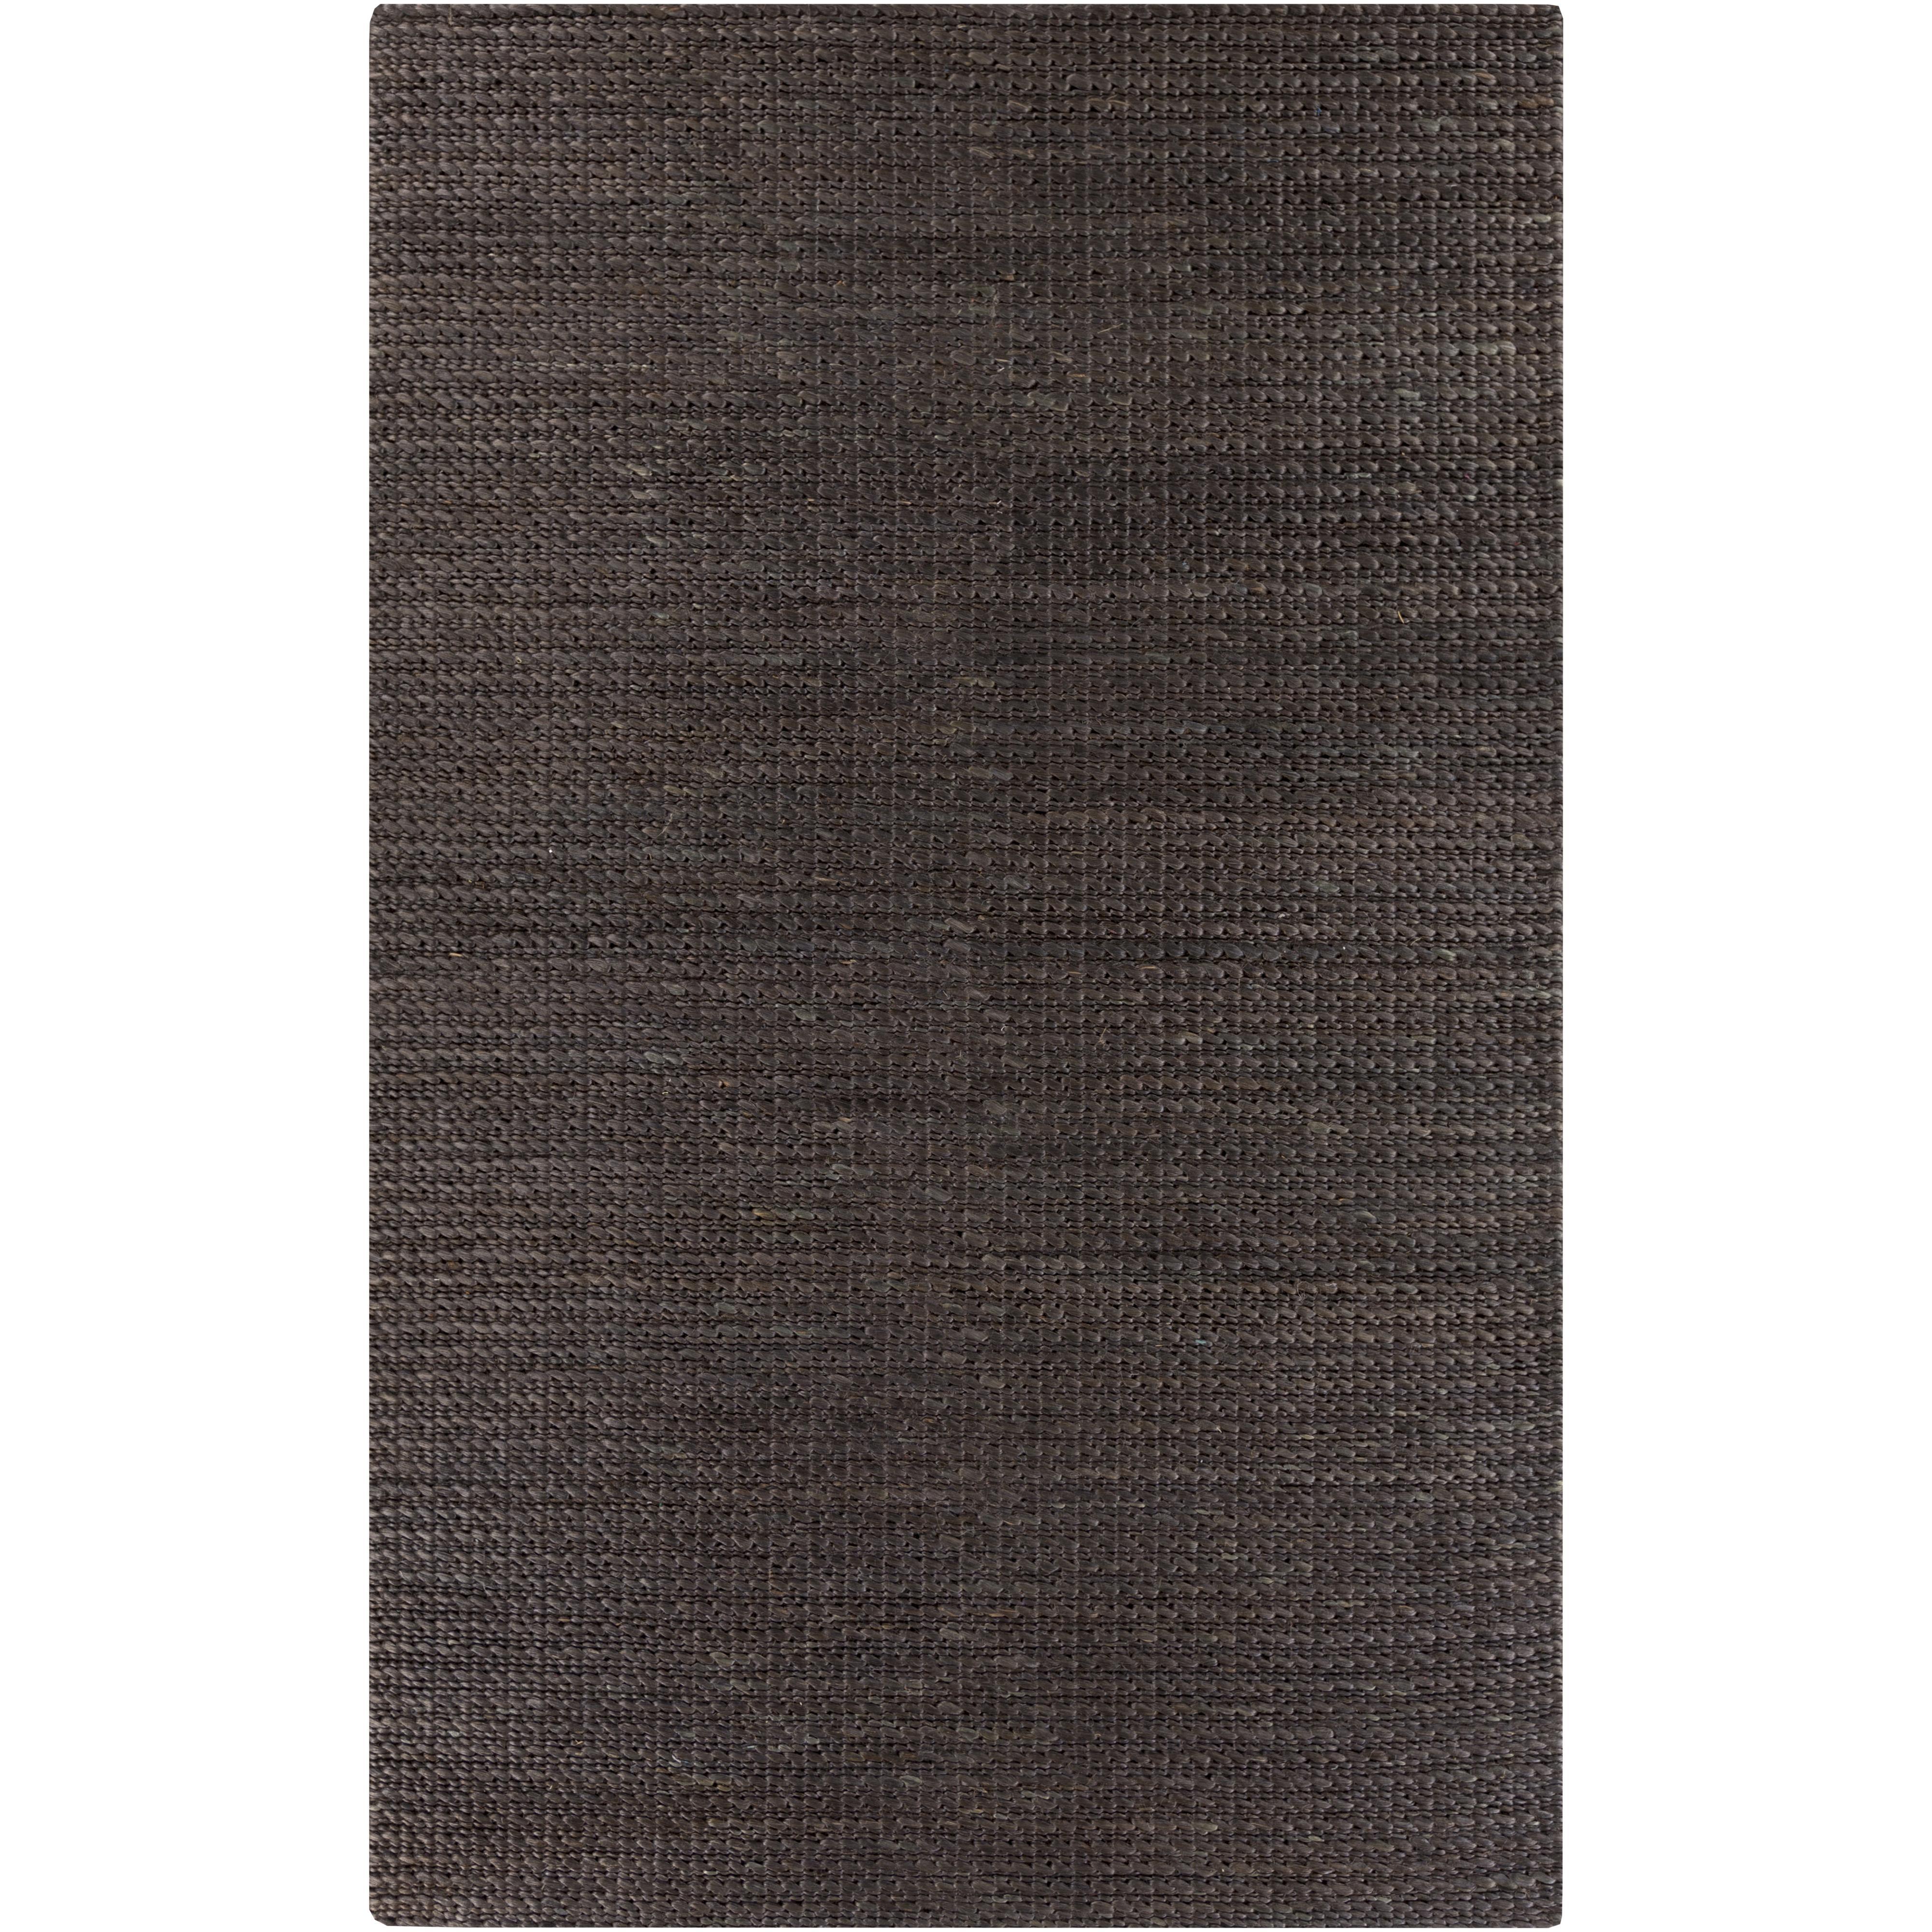 Surya Rugs Tropics 8' x 11' - Item Number: TRO1033-811